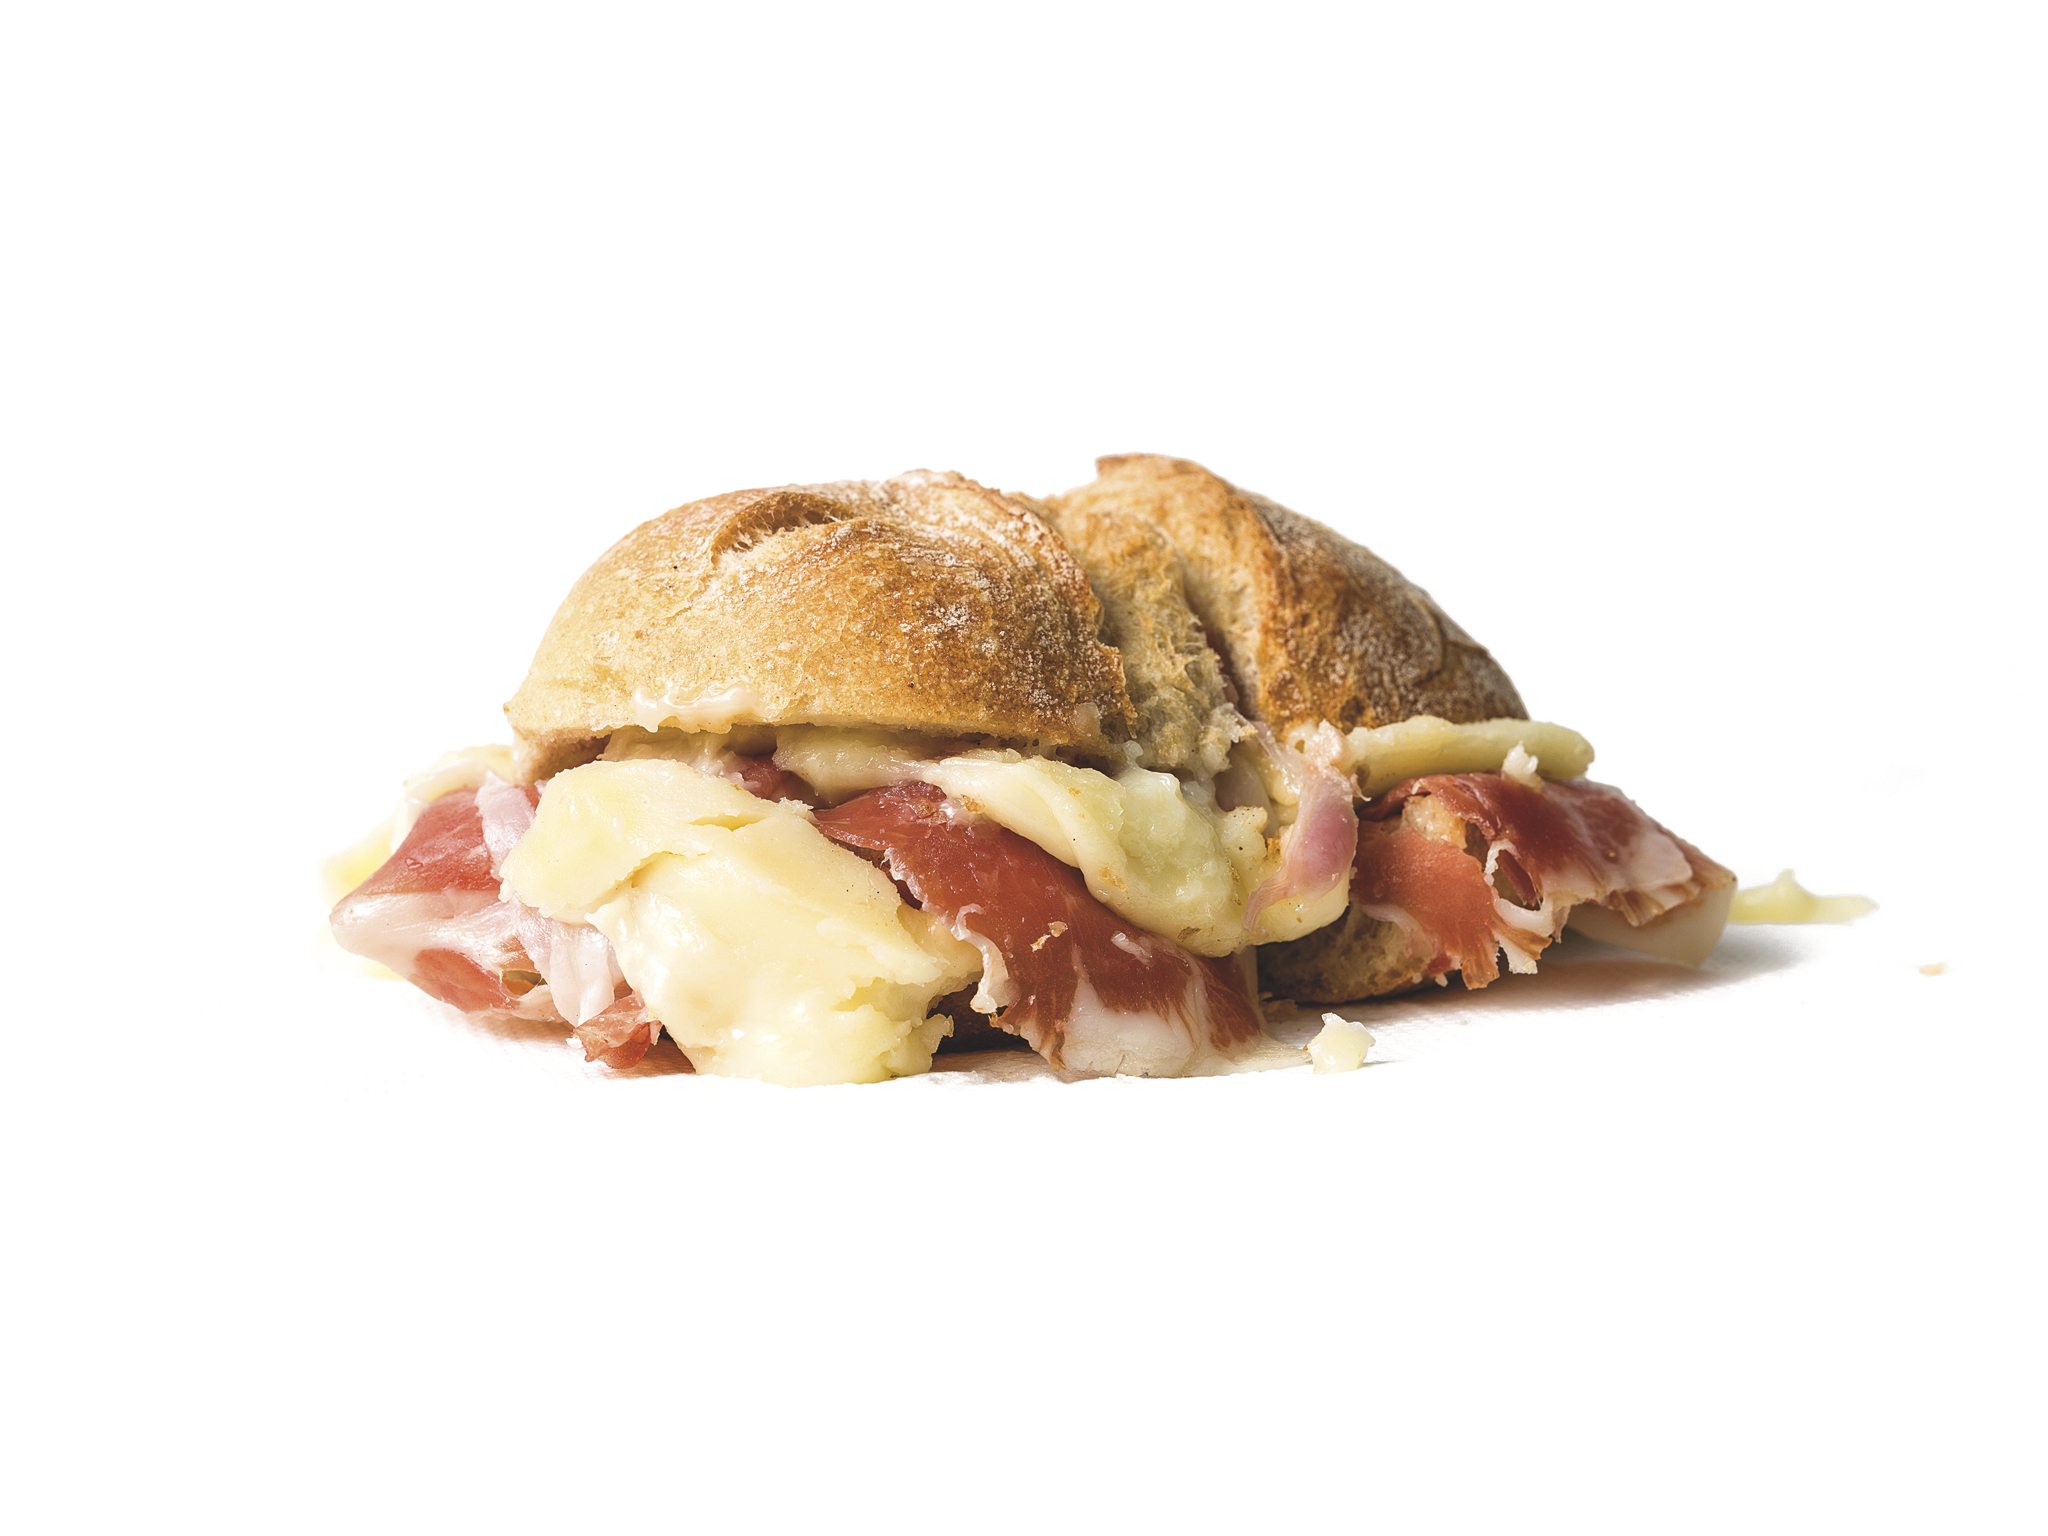 Have a sandwich